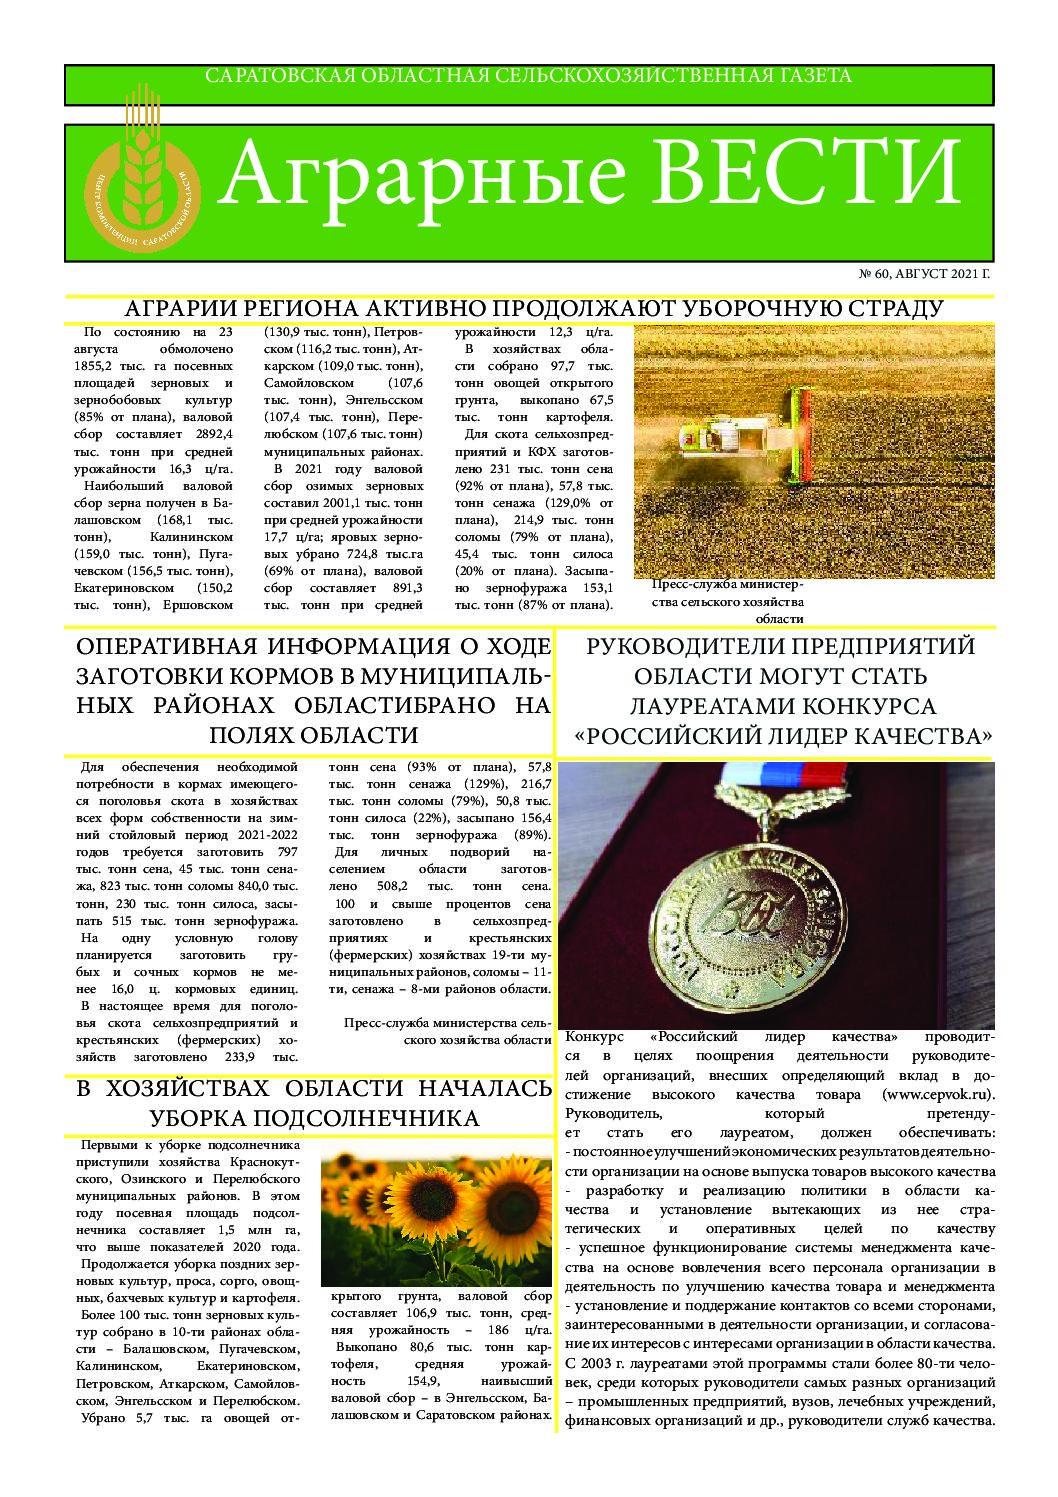 https://saratovagro.ru/wp-content/uploads/2021/08/Газета-август-2021-pdf.jpg